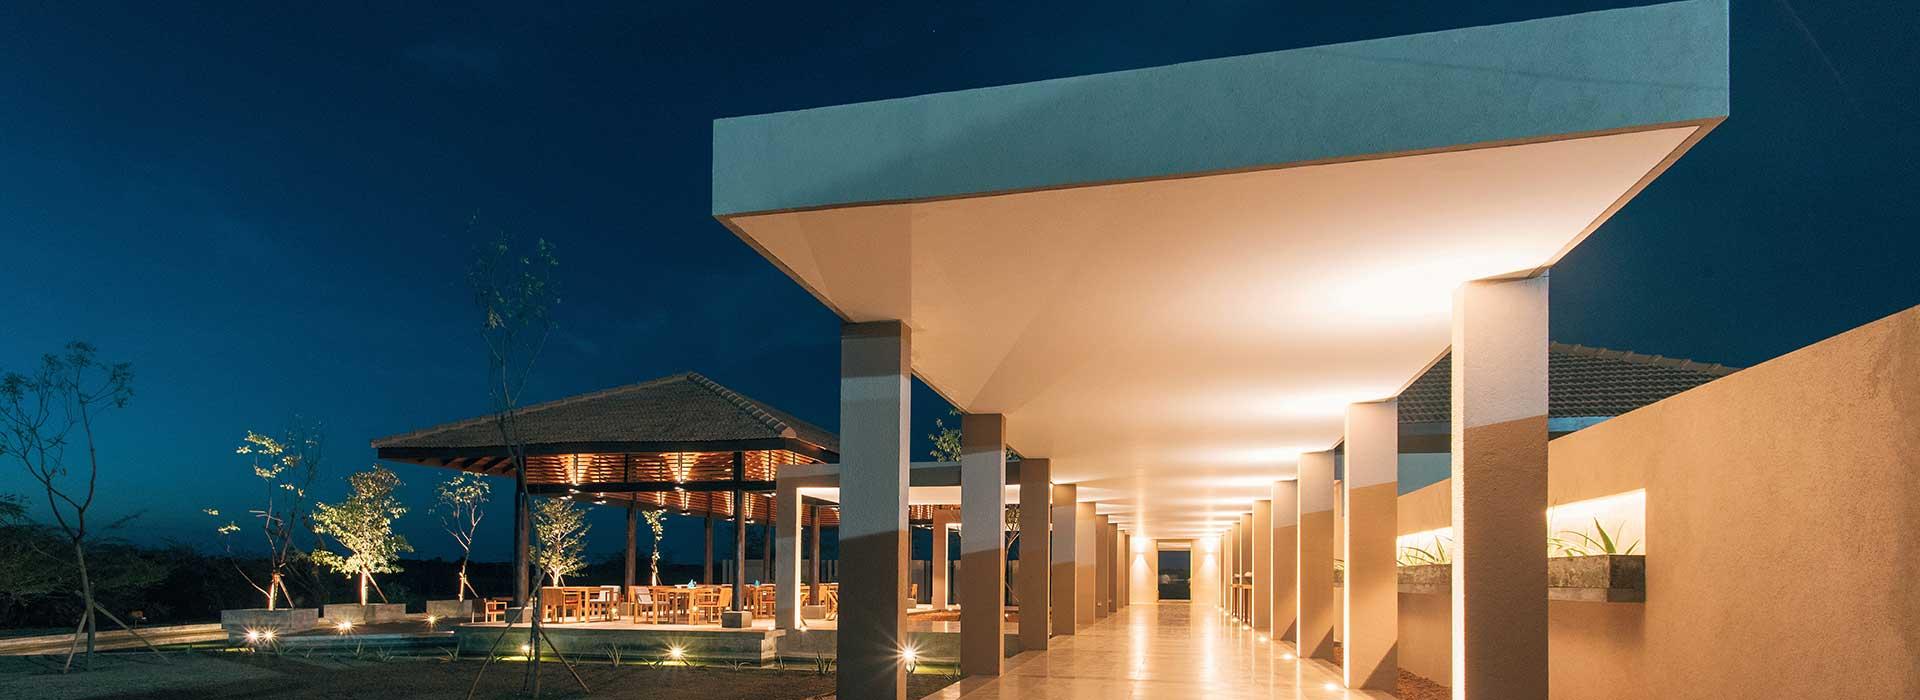 Entrance to Palmyrah House Luxury Boutique Hotel in Mannar Sri Lanka